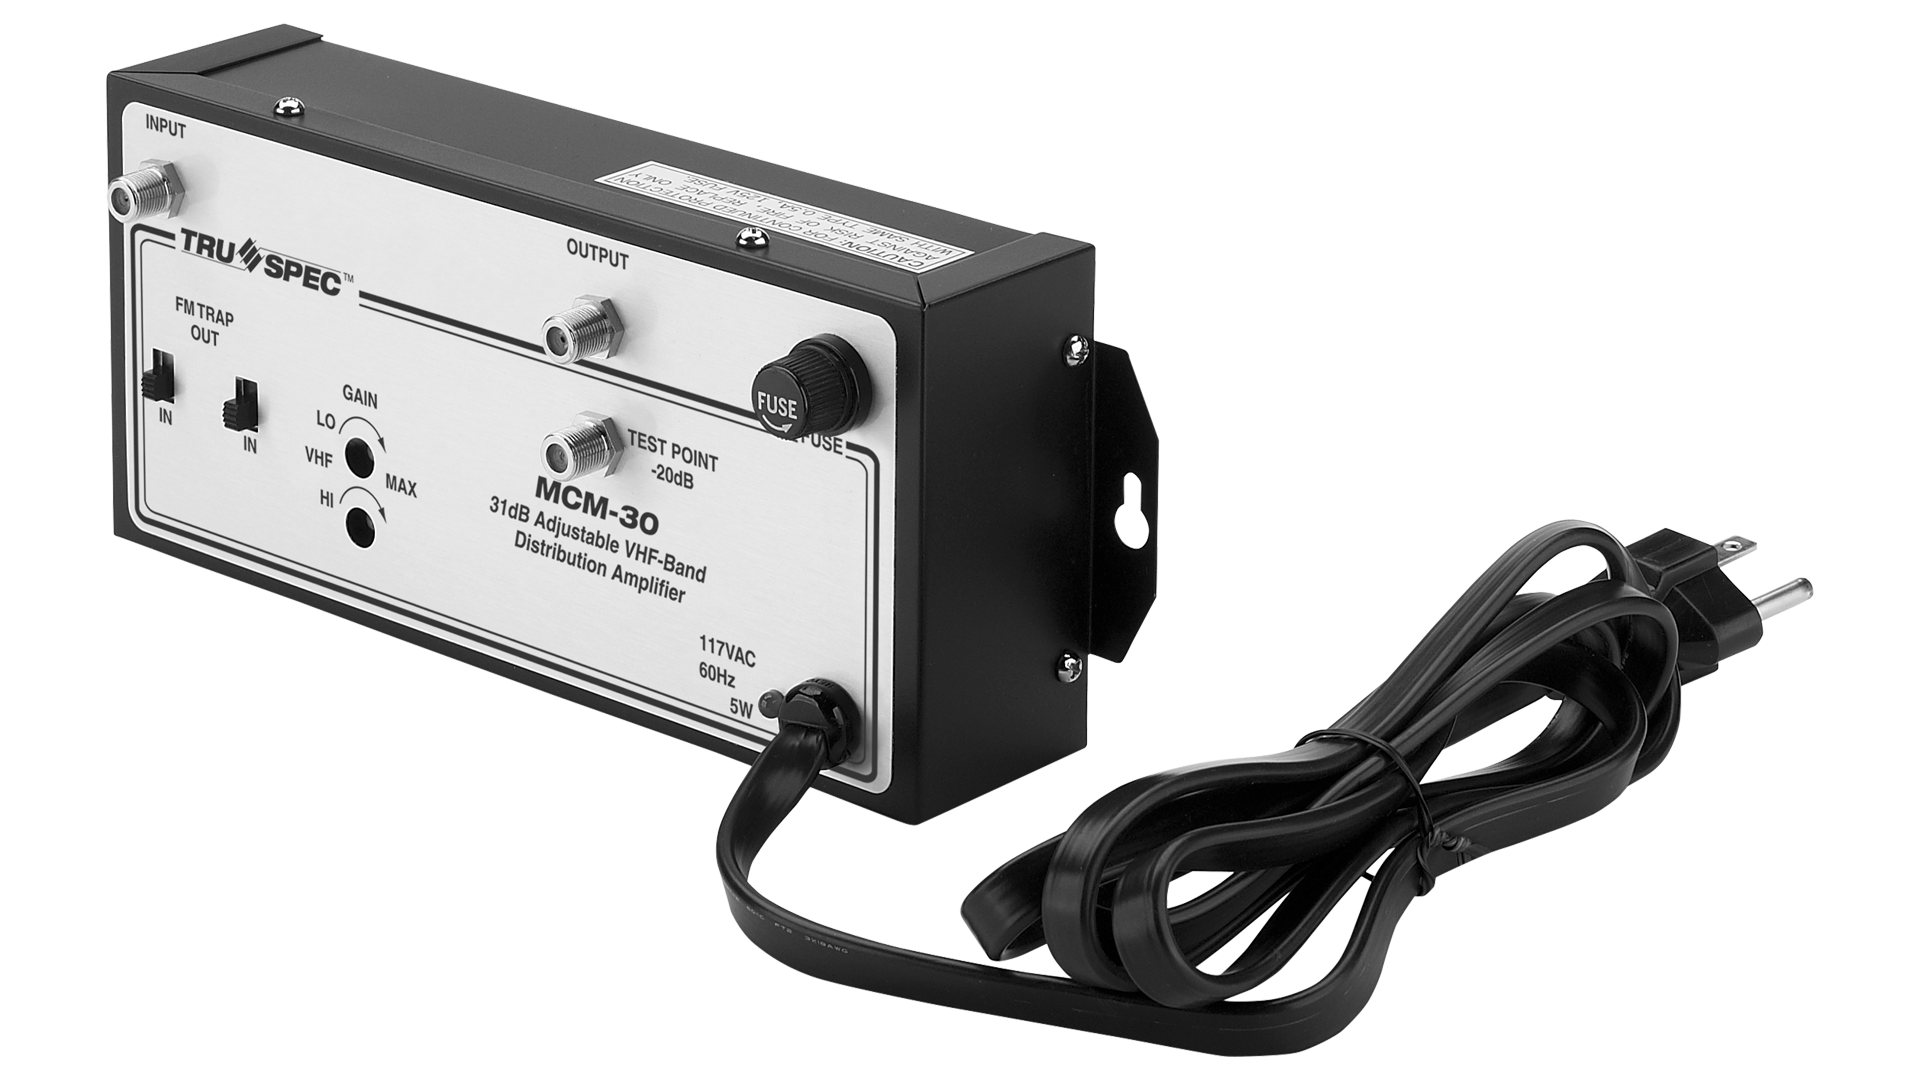 MCM-30: 30dB Adjustable VHF-Band Distribution Amplifier